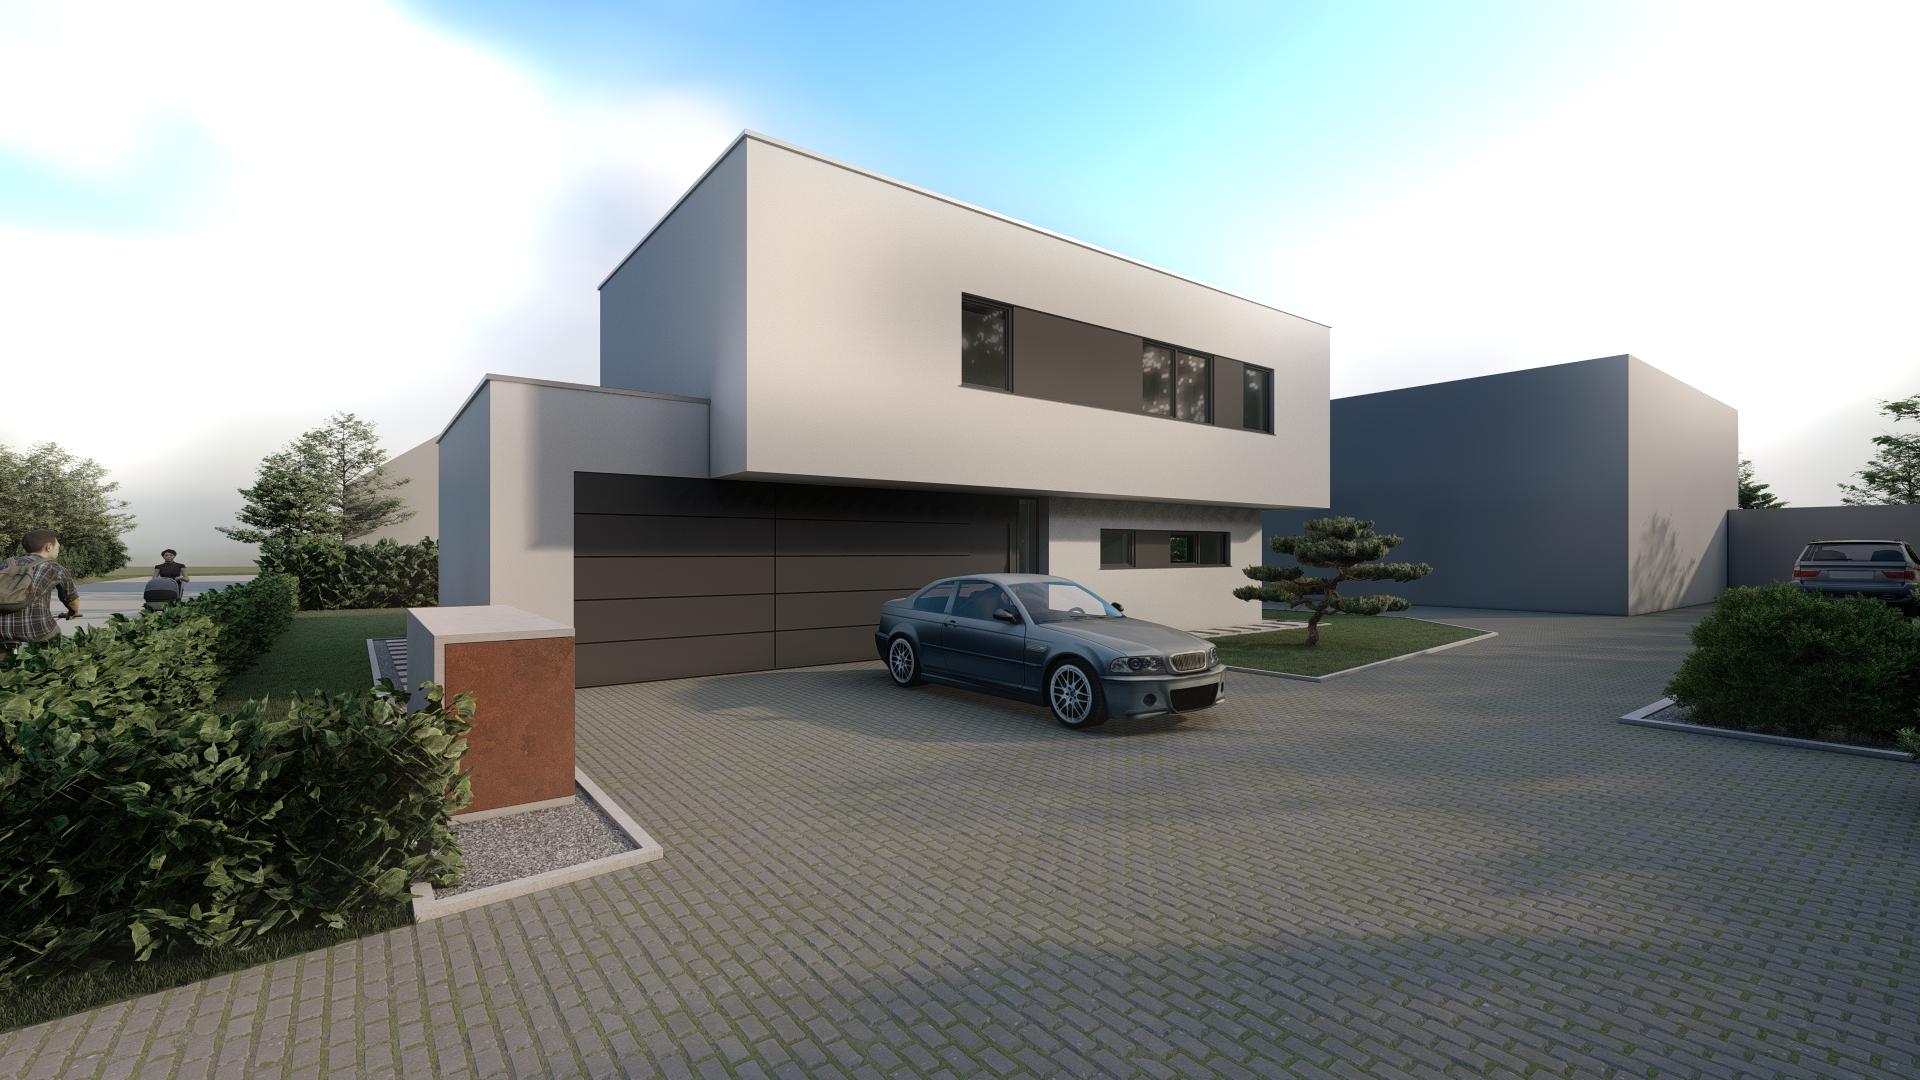 Einfamilienhaus Bielefeld I